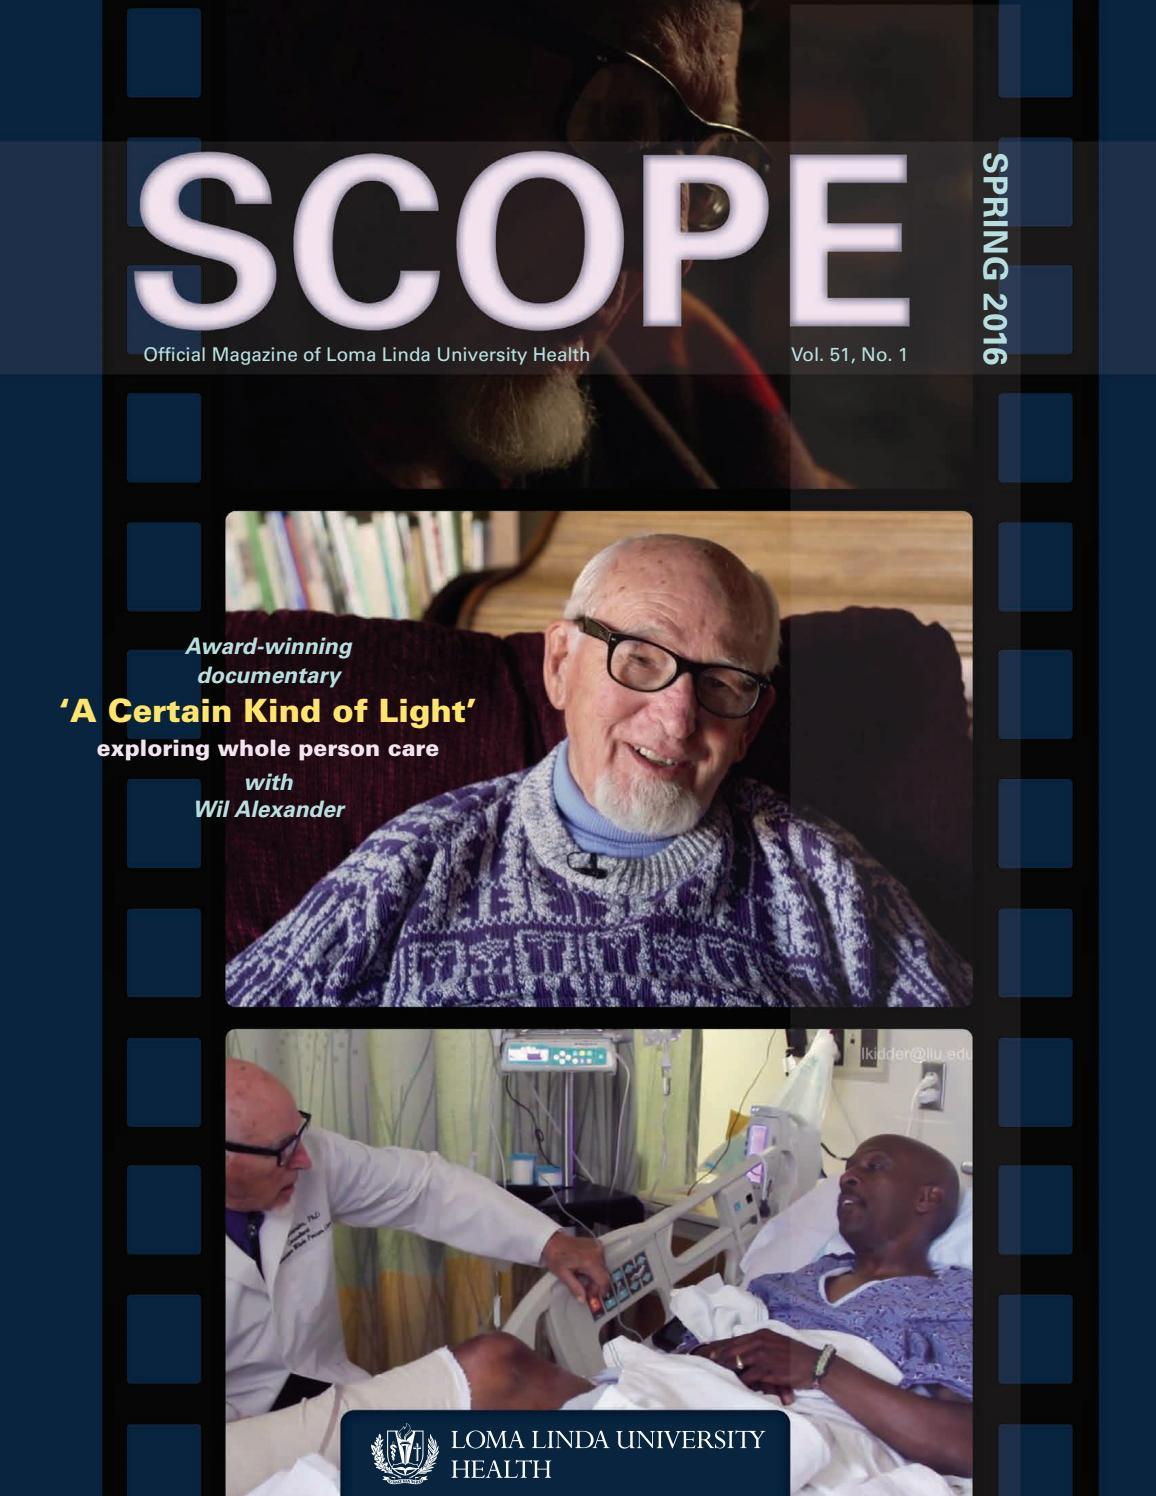 Scope Spring 2016 - Vol  51 No  1 by Loma Linda University